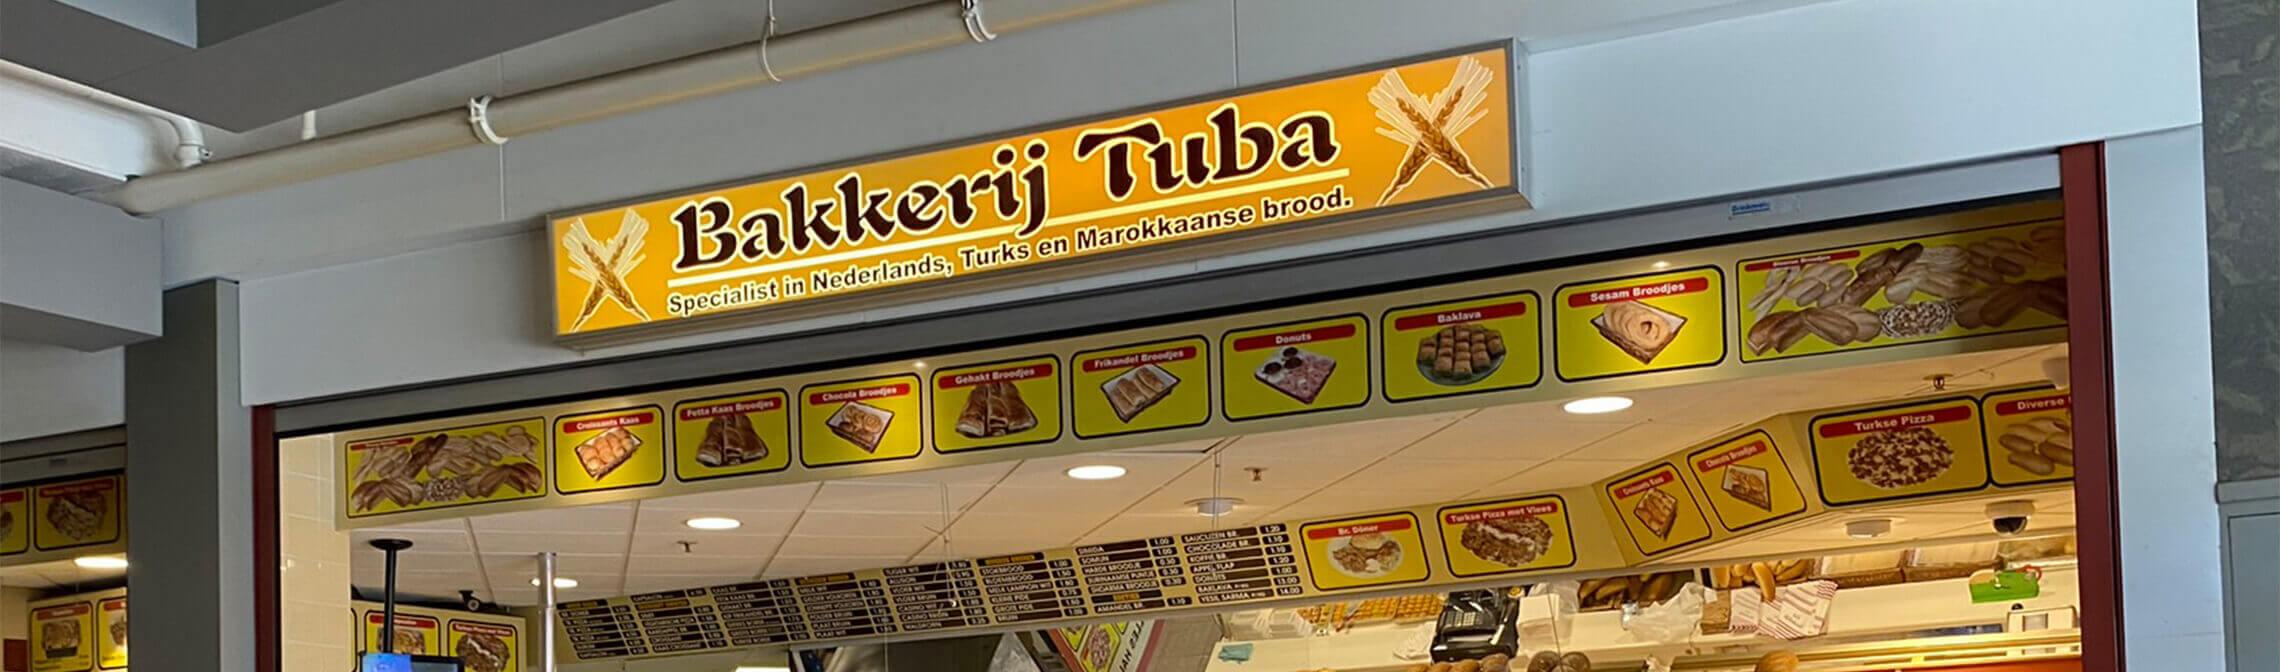 Bakkerij Tuba Header